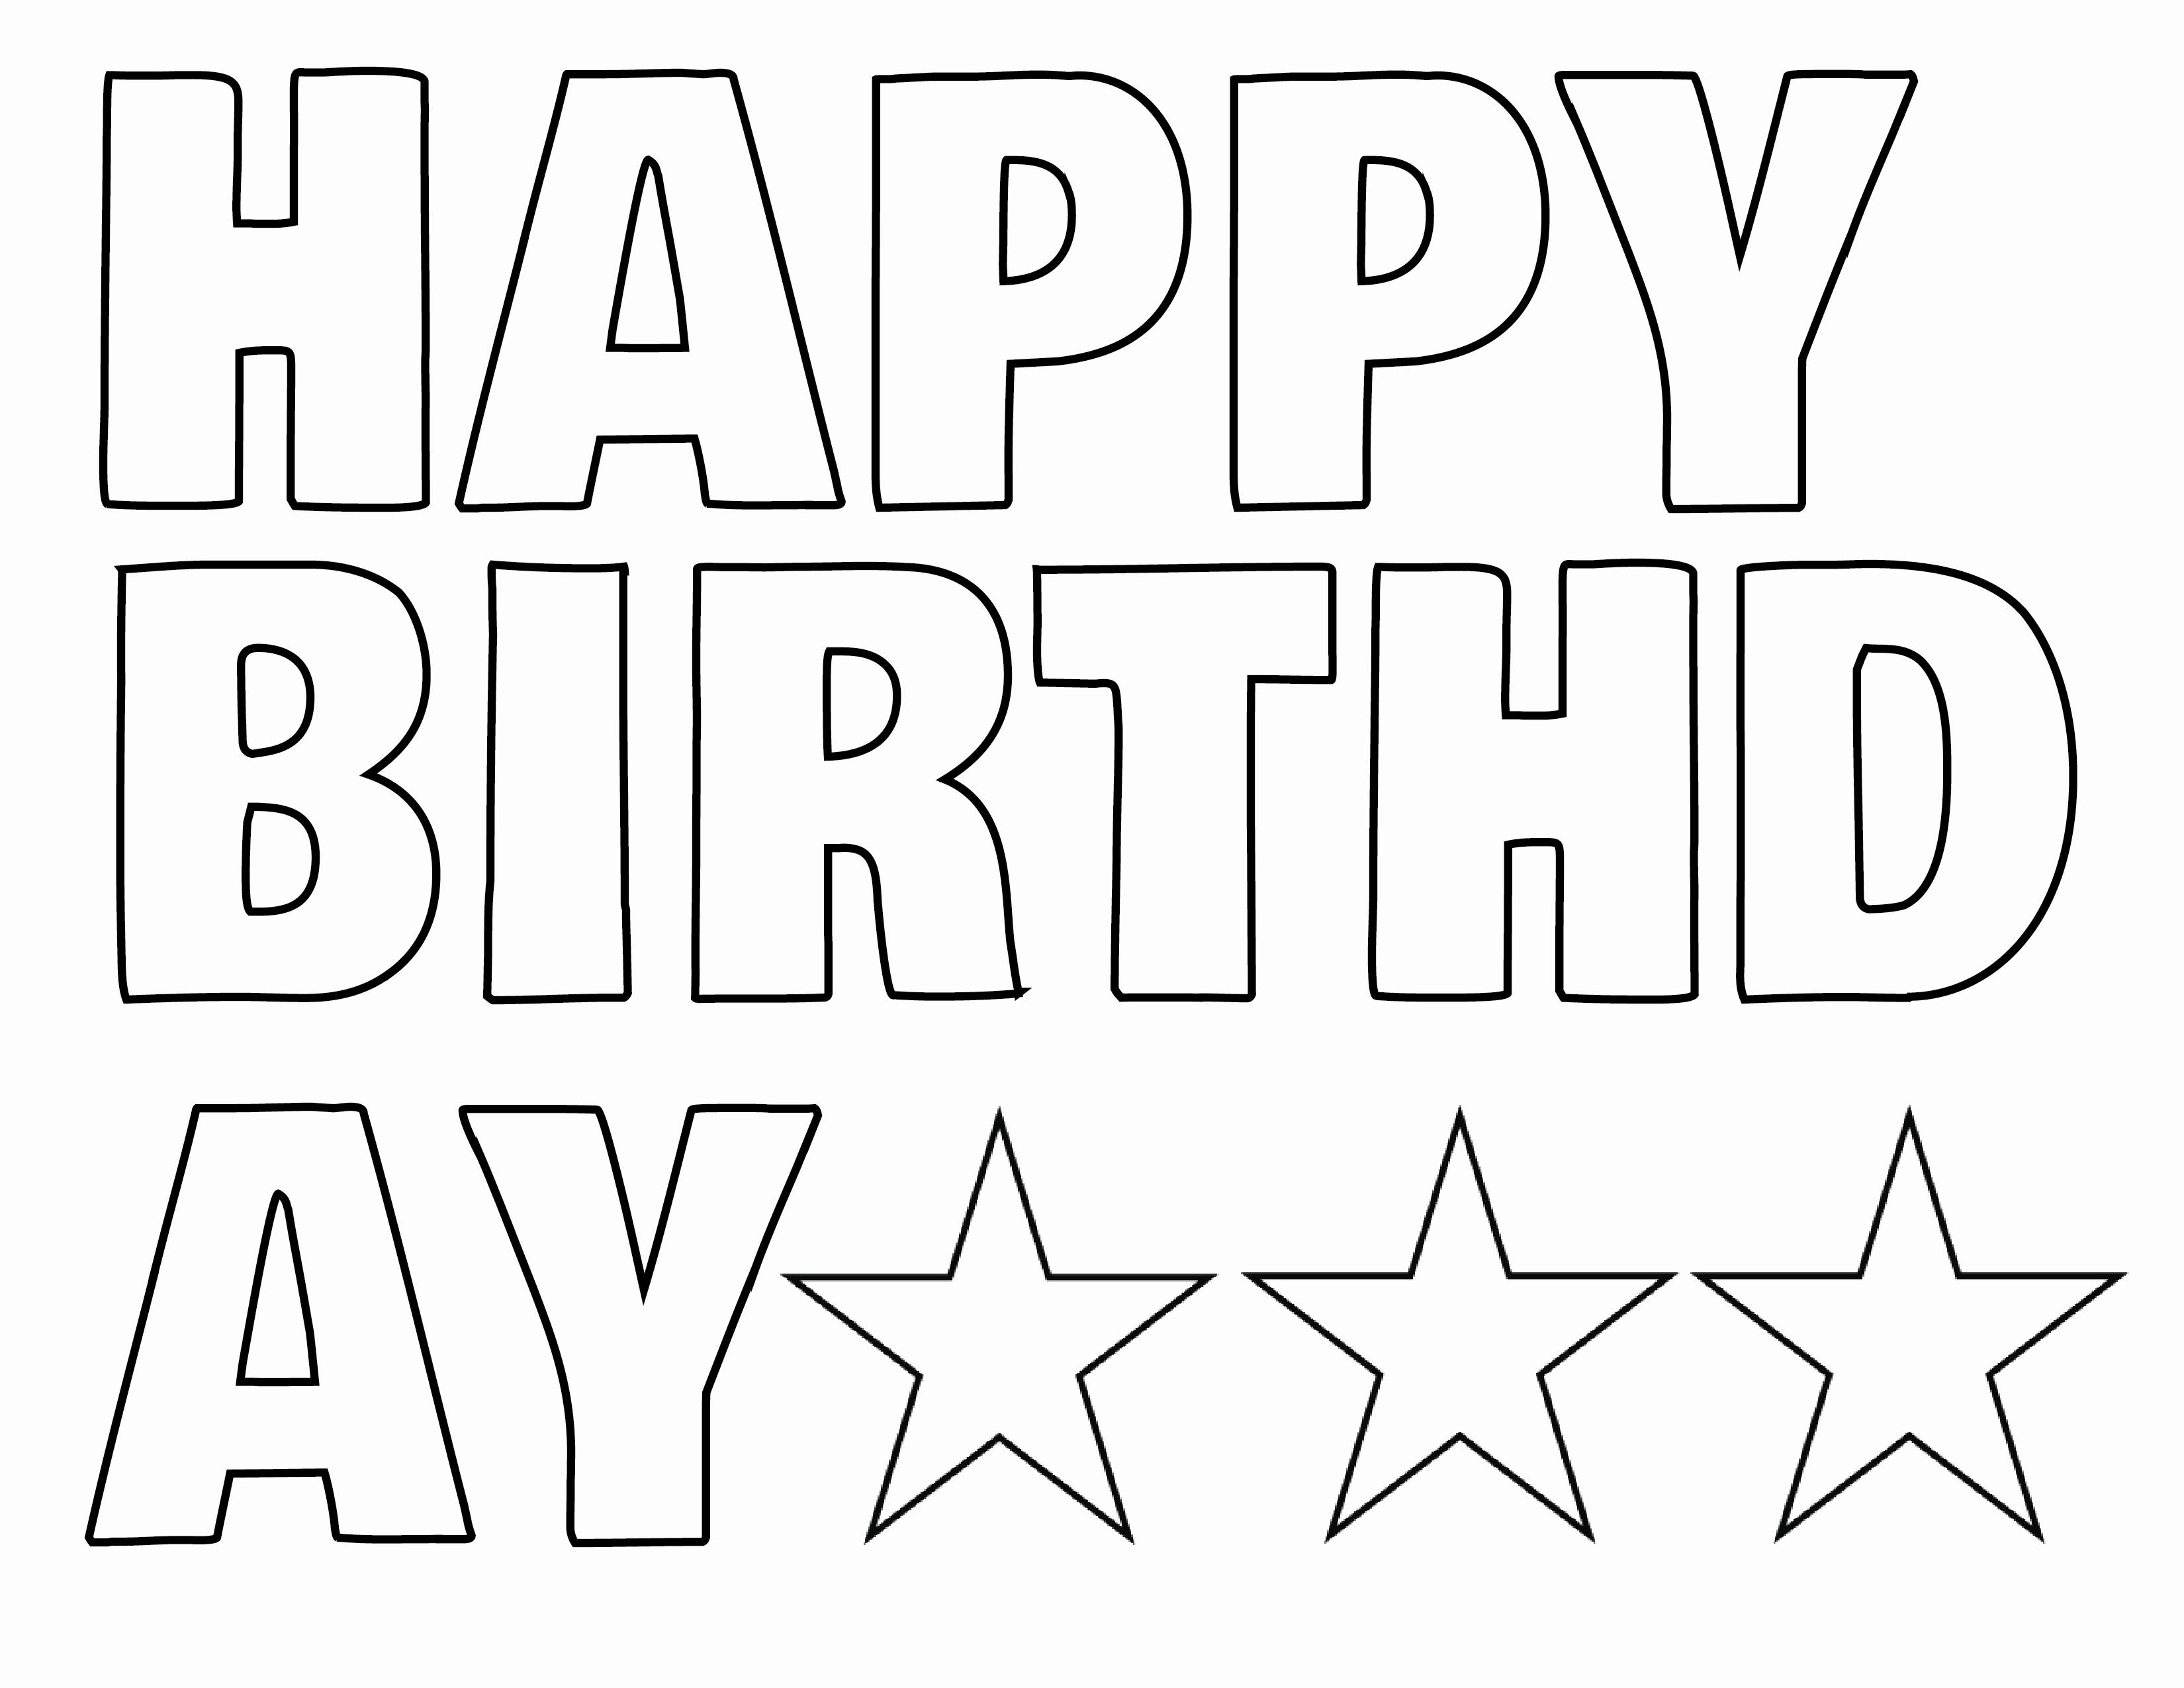 Happy Birthday Banner Print Out New Diy Glitter Birthday Banner